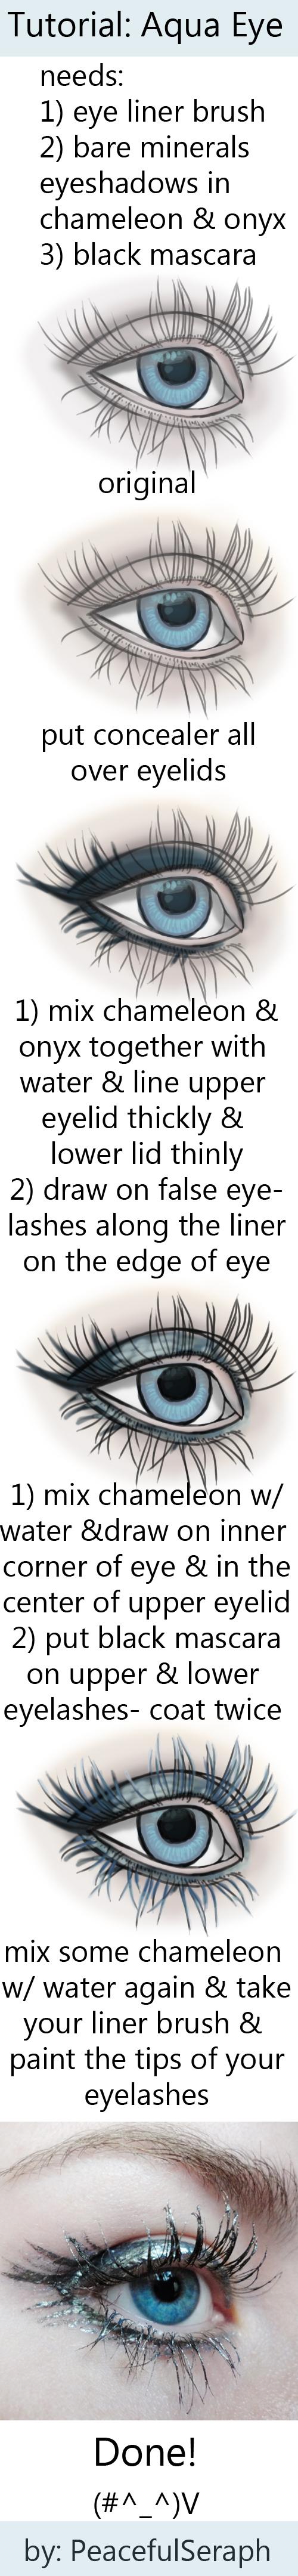 Make-up Tutorial: Aqua Eye by PeacefulSeraph